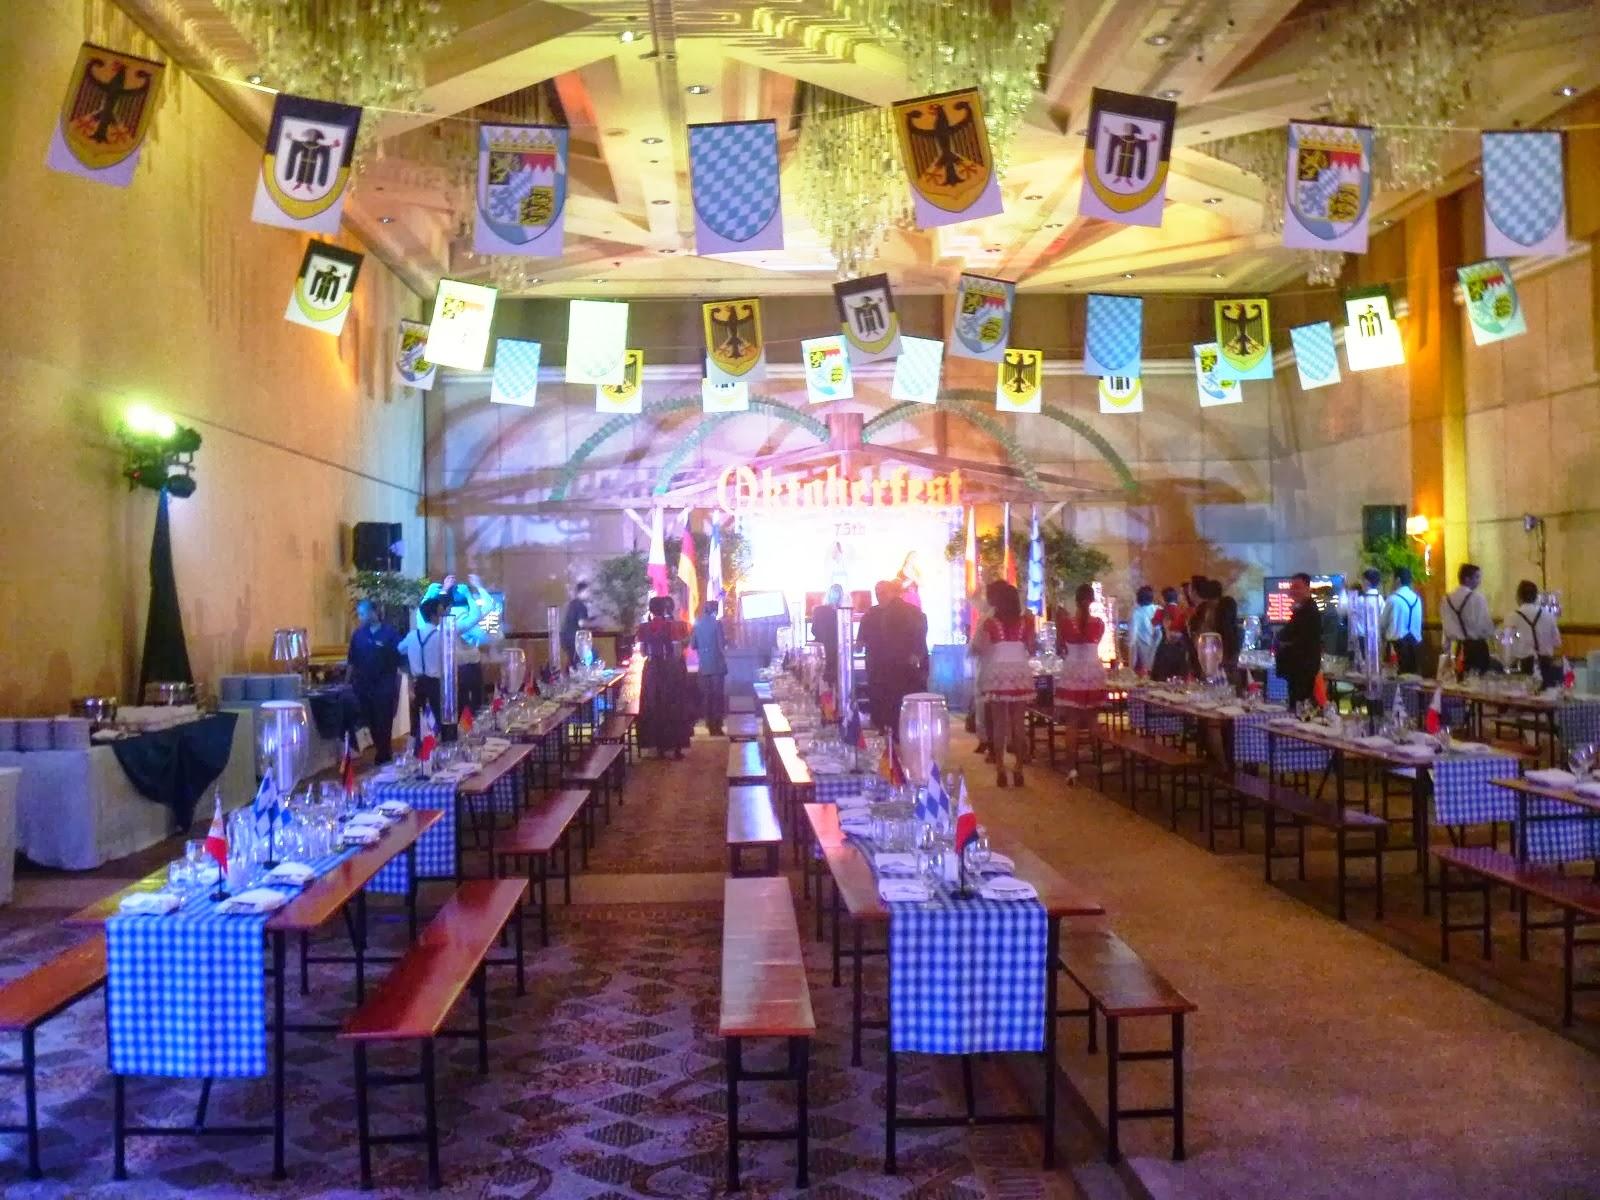 Sofitel Philippine Plazau0027s Mindanao Ballroom & F.Y.I. (Fire Your Imagination): September 2013